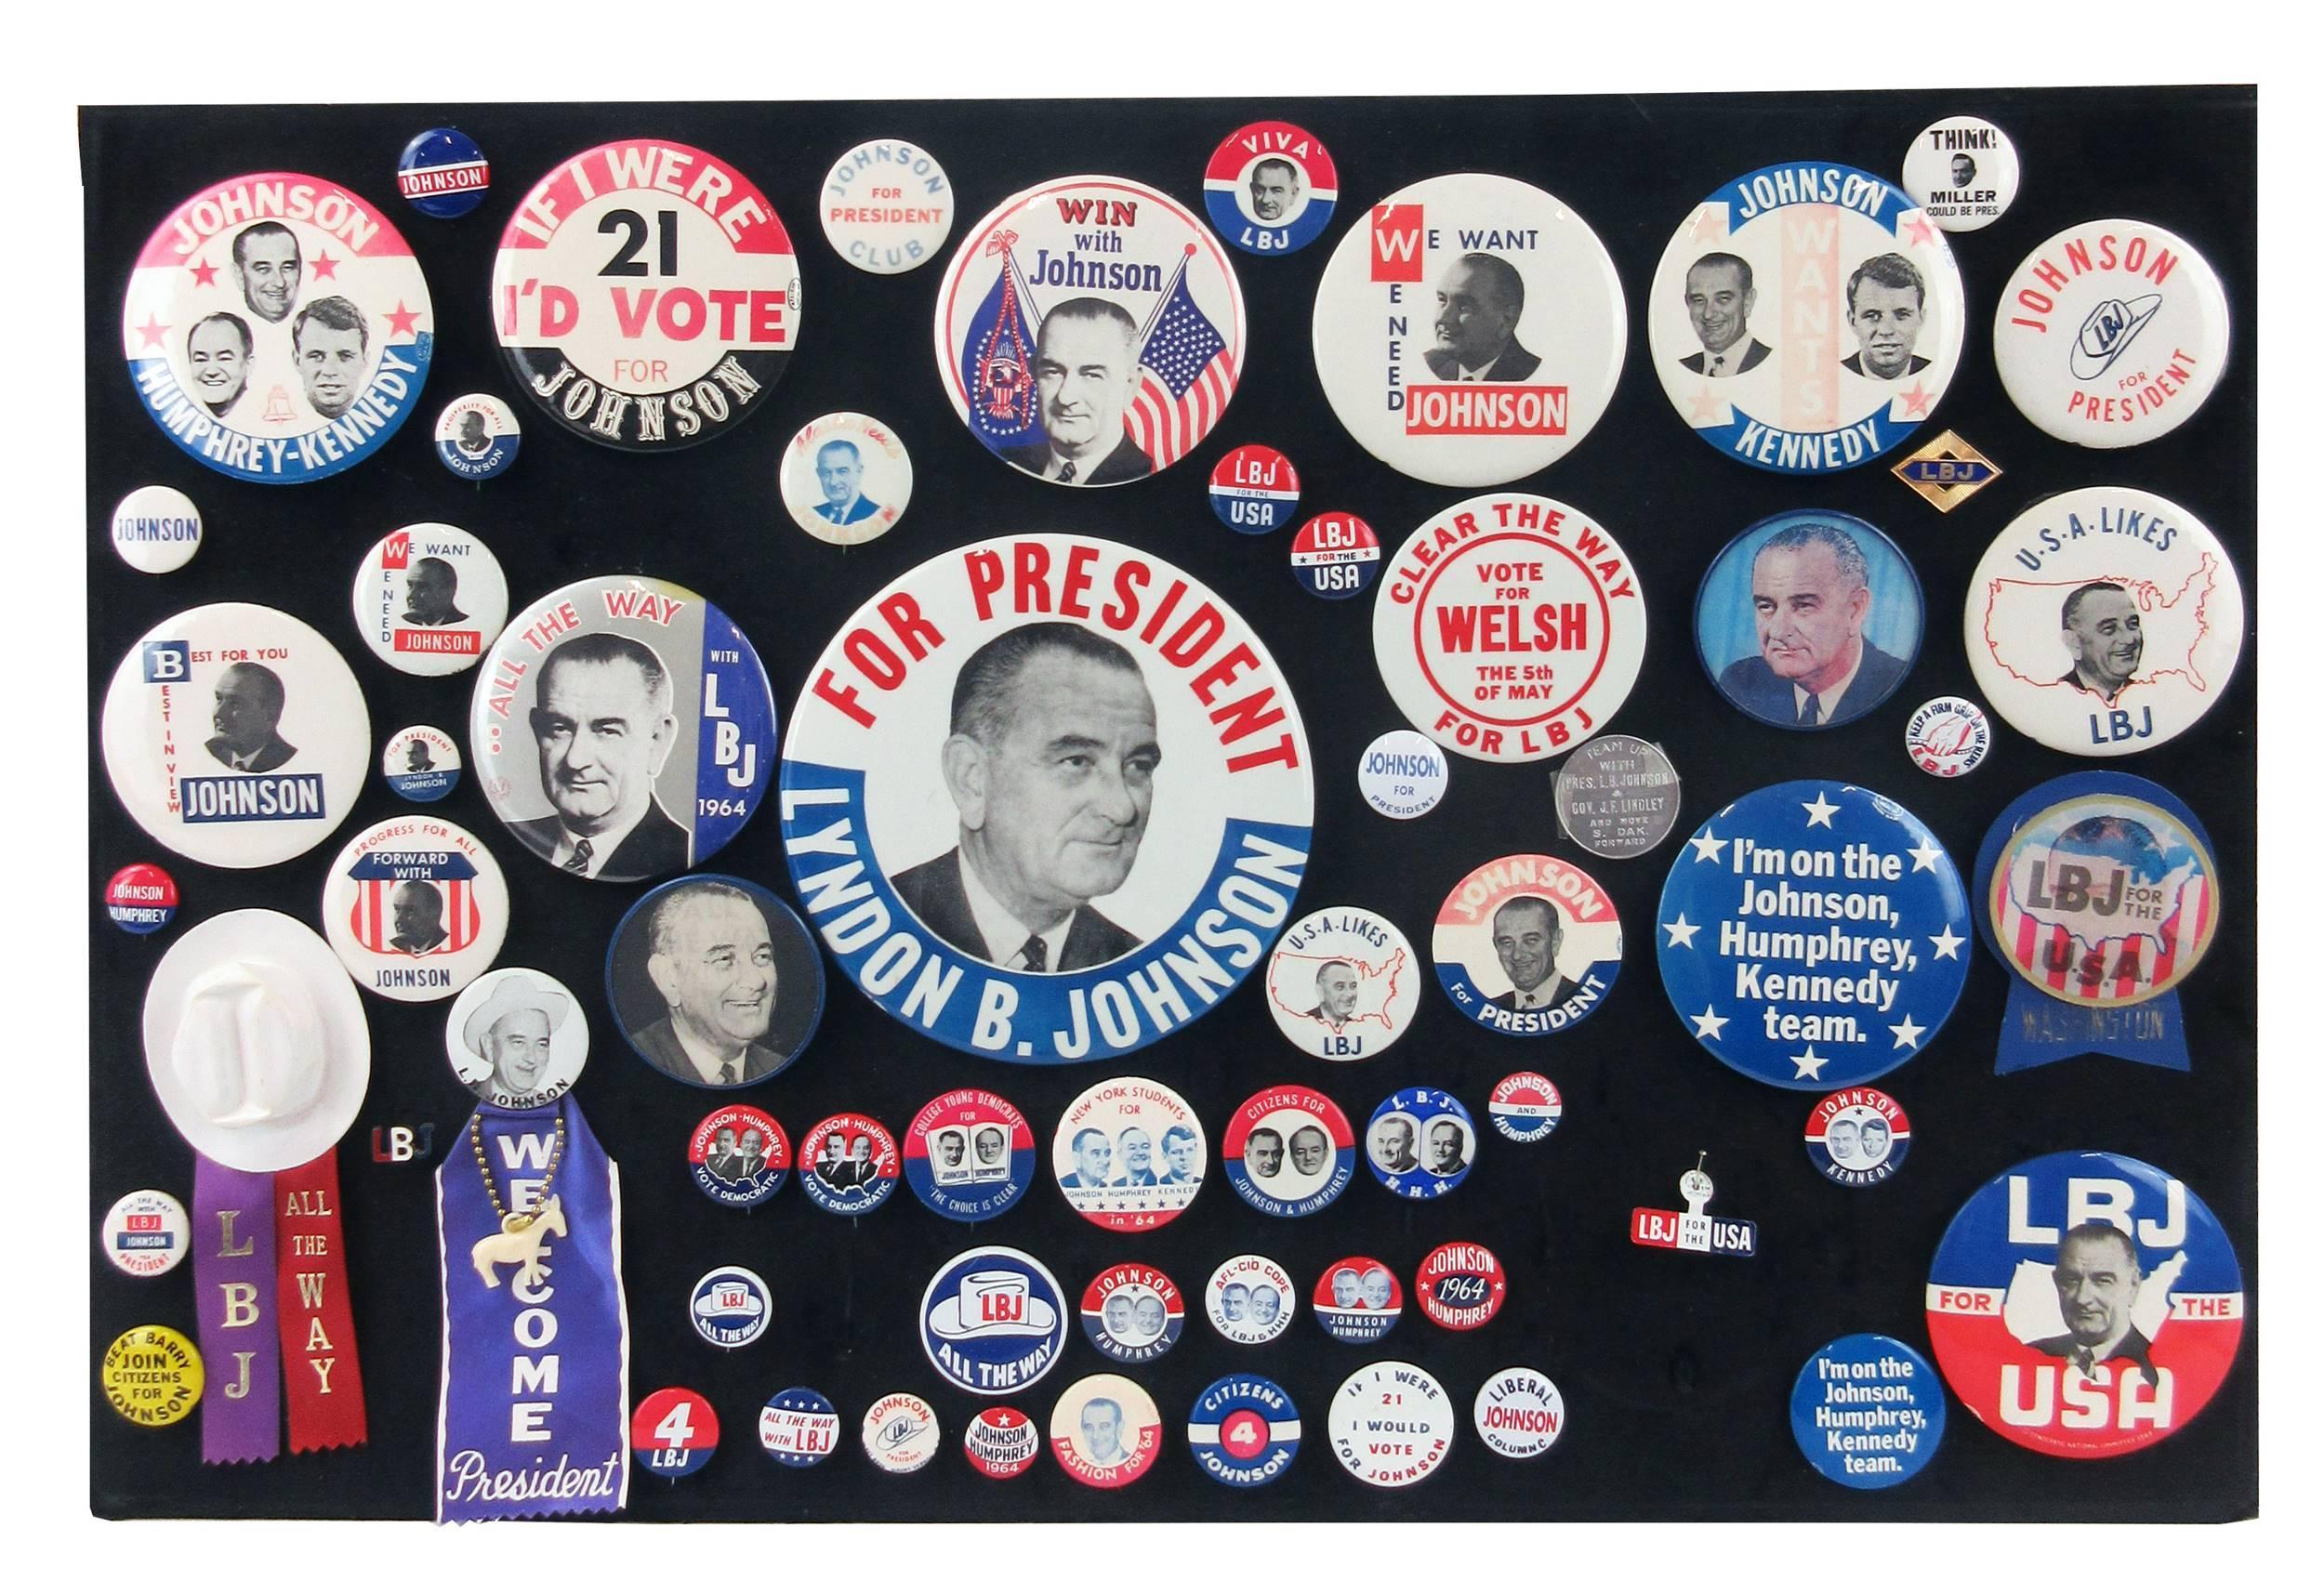 Lyndon B. Johnson Campaign Pinbacks & Memorabilia, 60+ Pcs